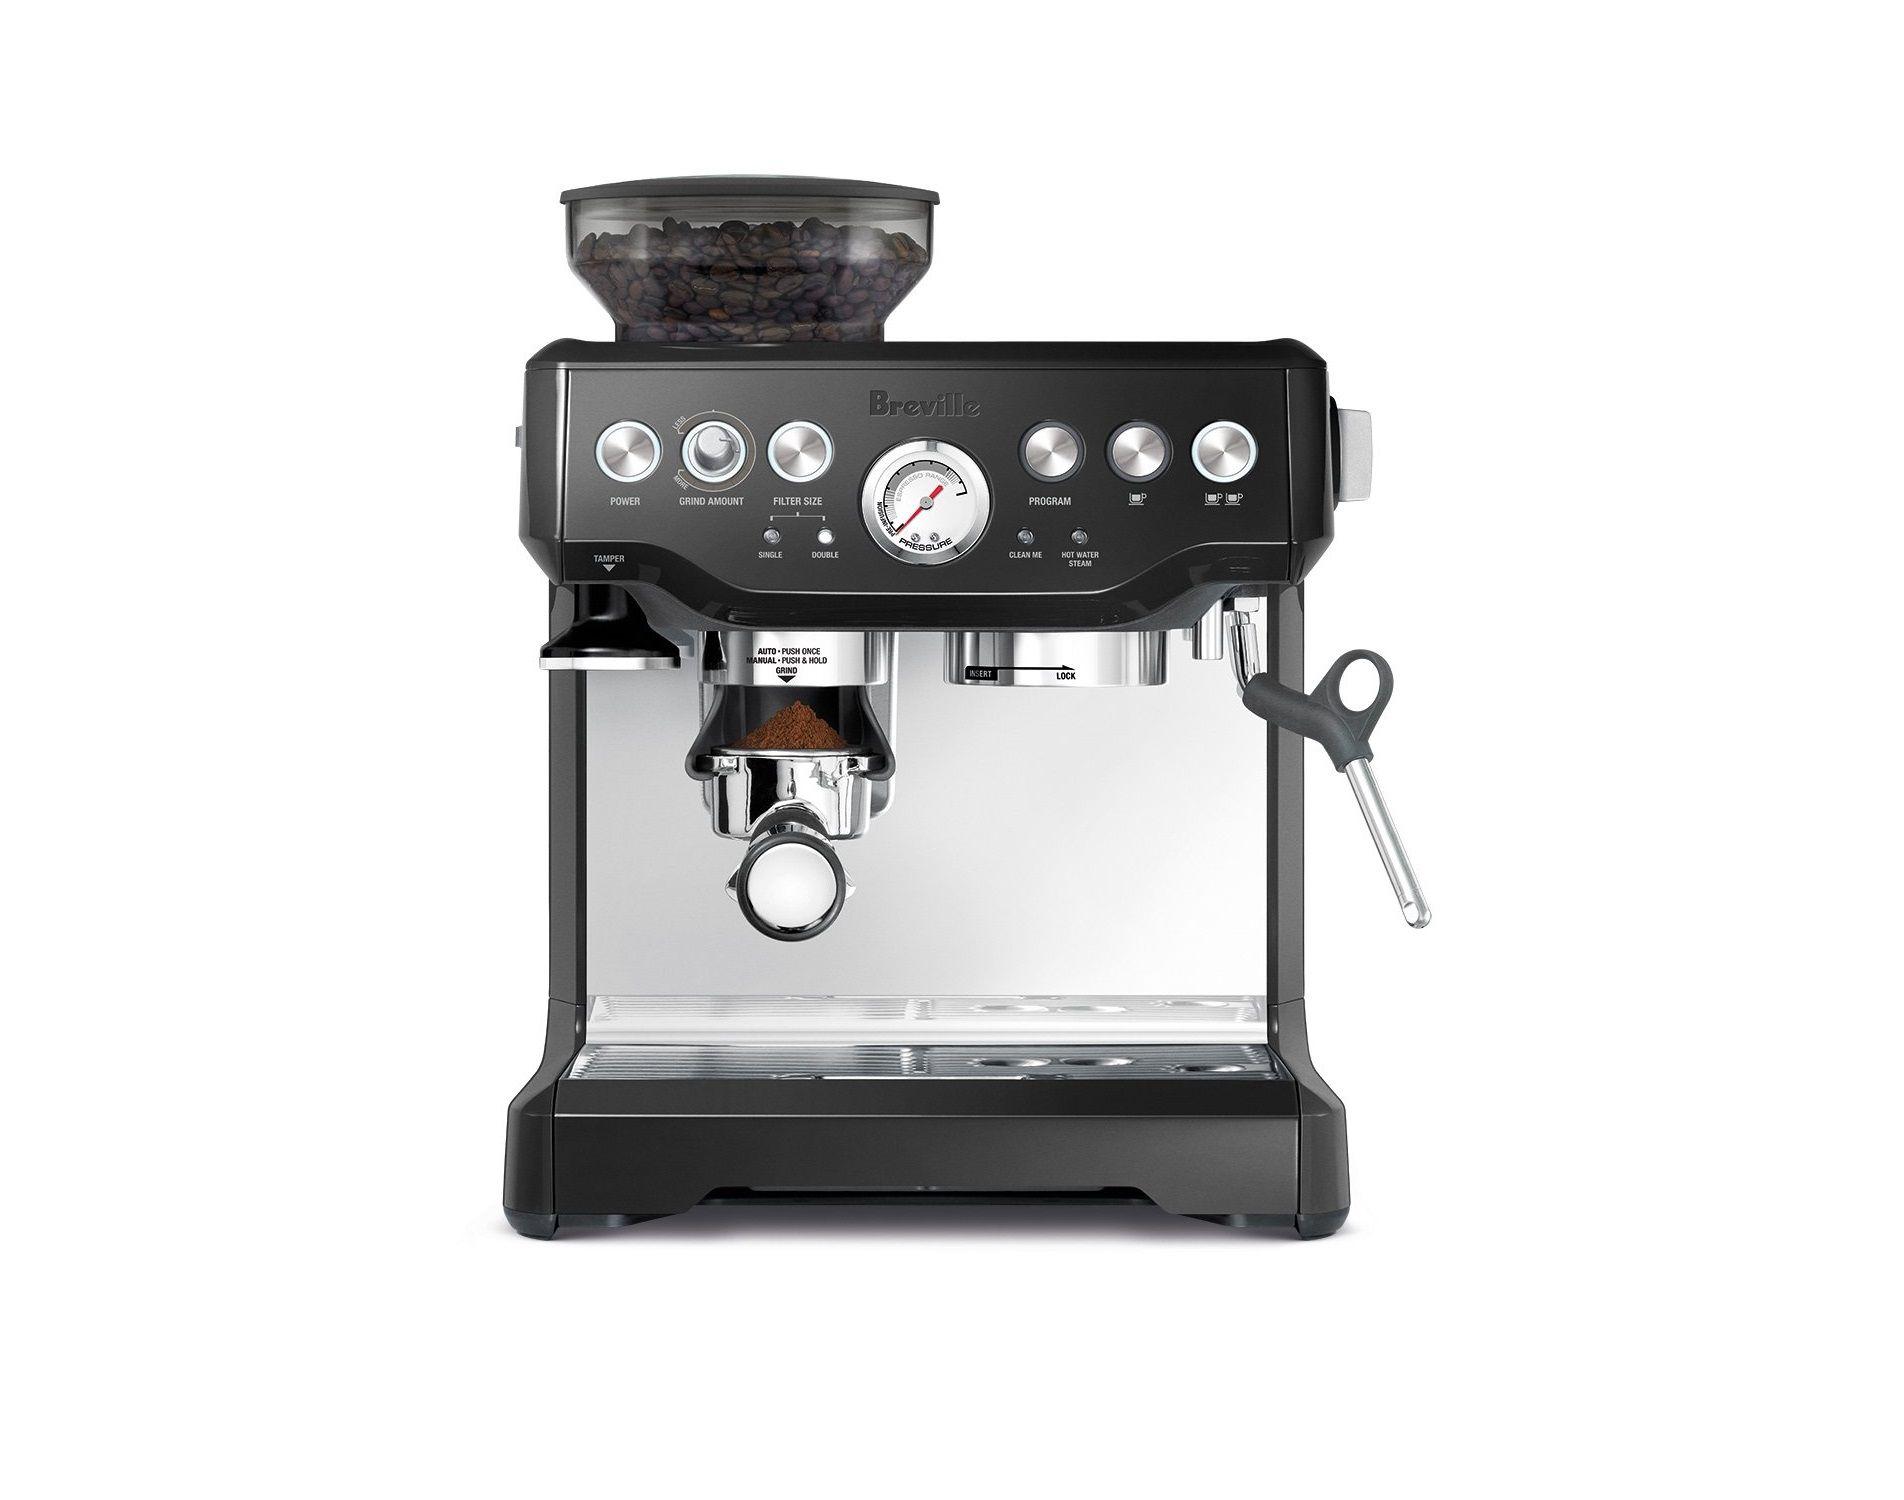 Top 5 Best Breville Espresso Machines Review In 2019 Breville Espresso Machine Breville Espresso Espresso Machine Reviews